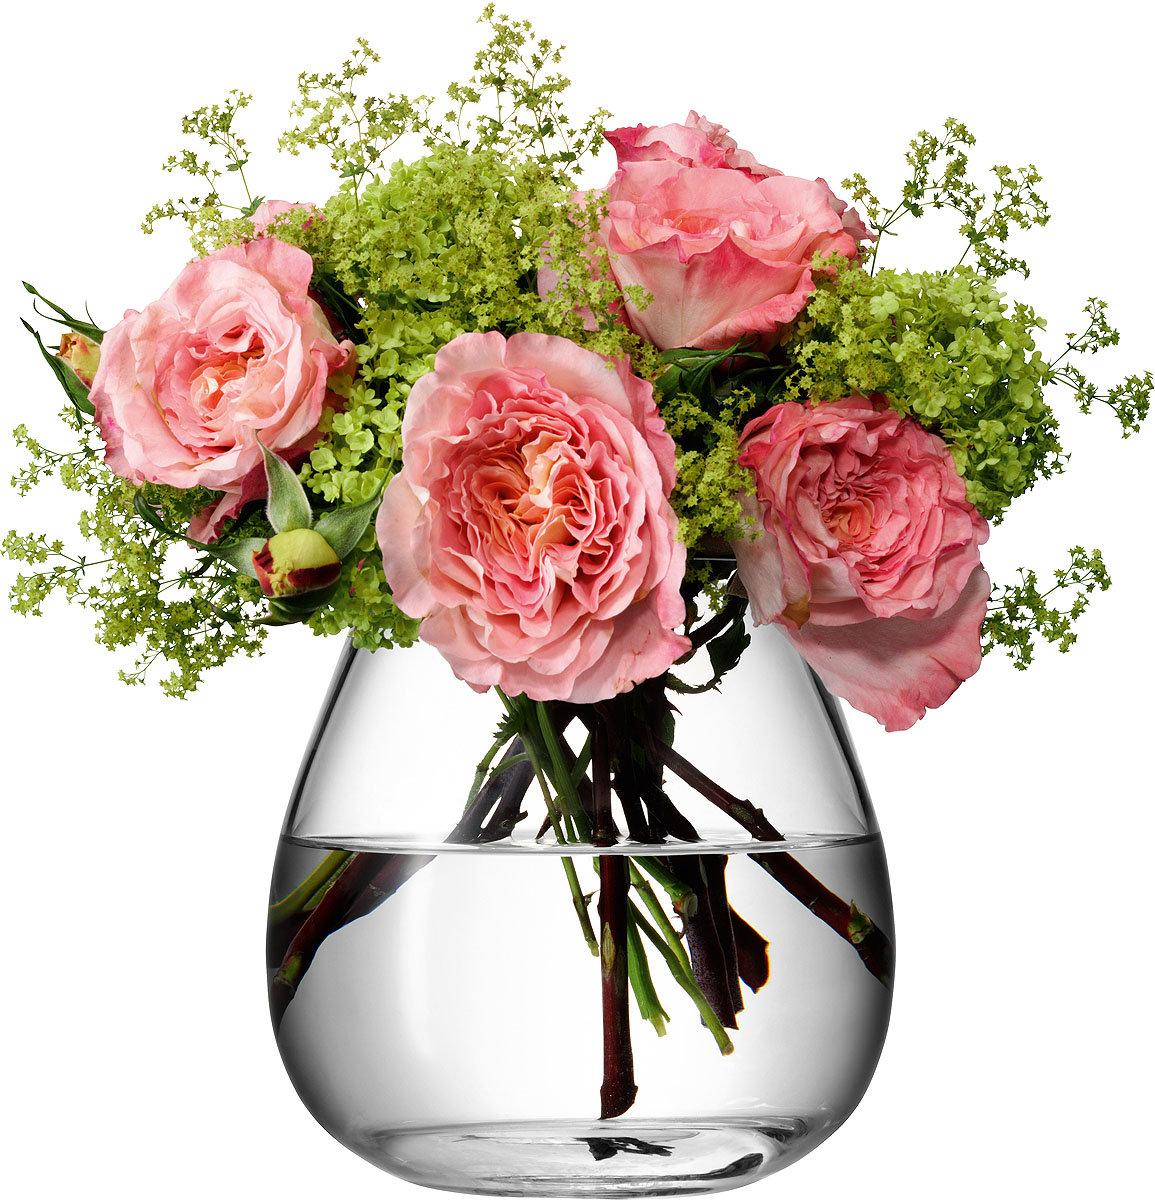 Стене квартире, картинки цветы в вазе